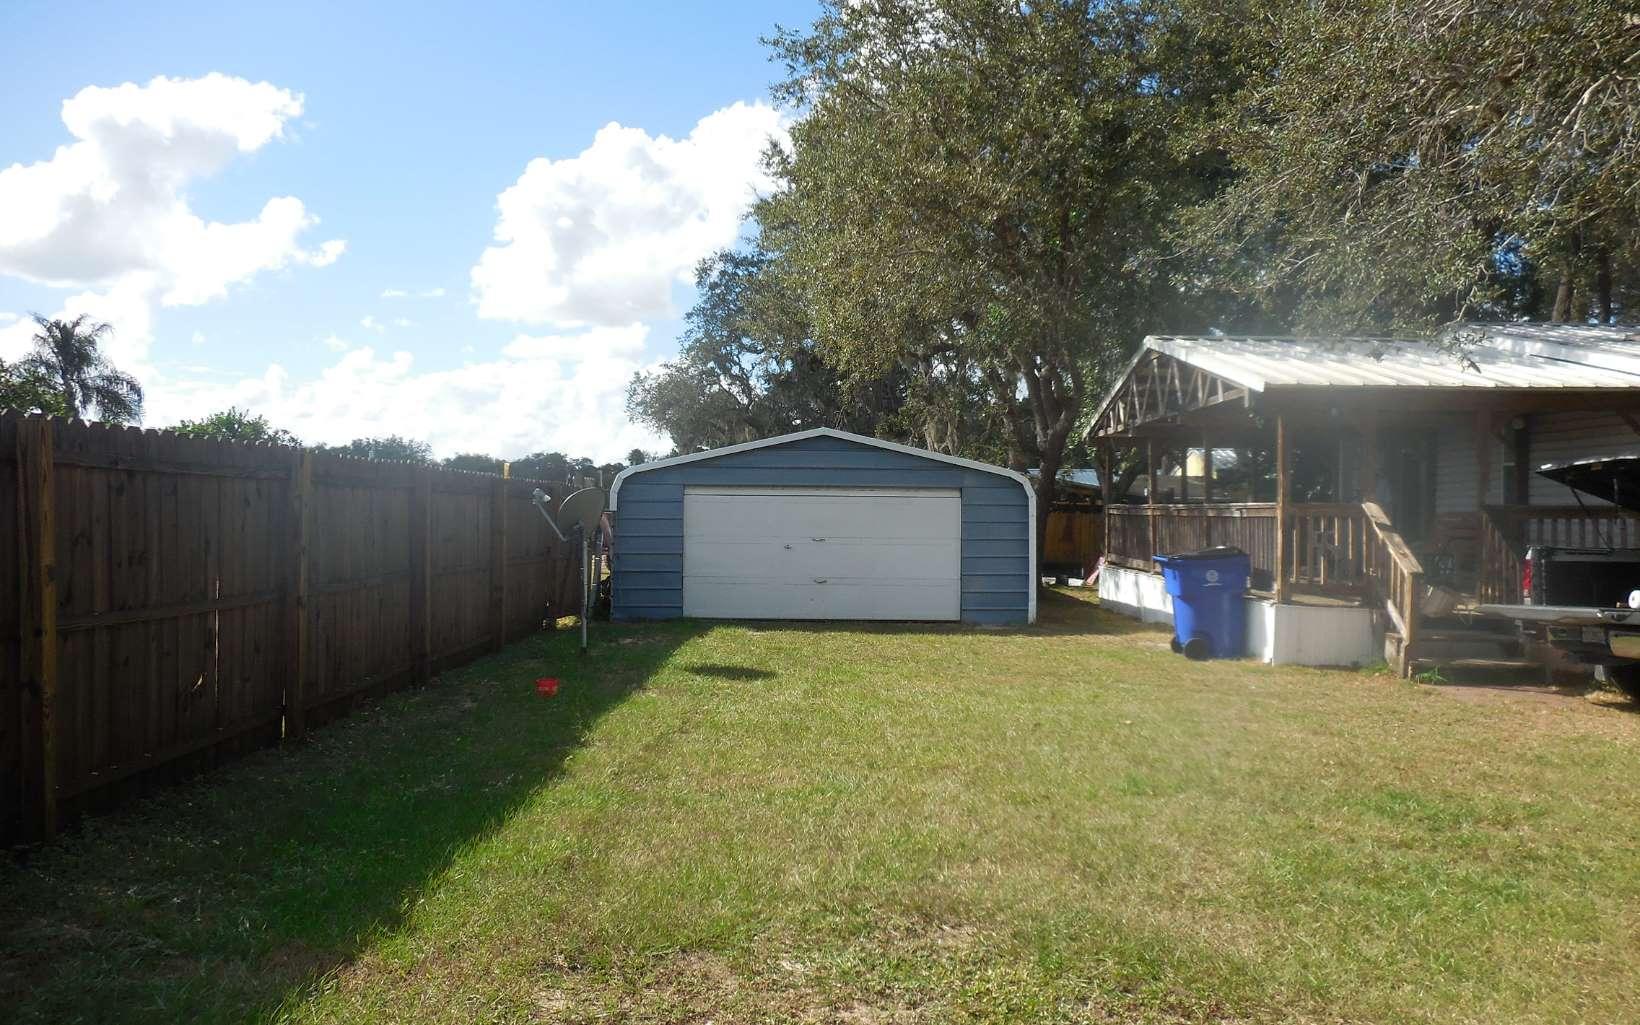 1301 W Gladiola Dr, Avon Park, FL 33825